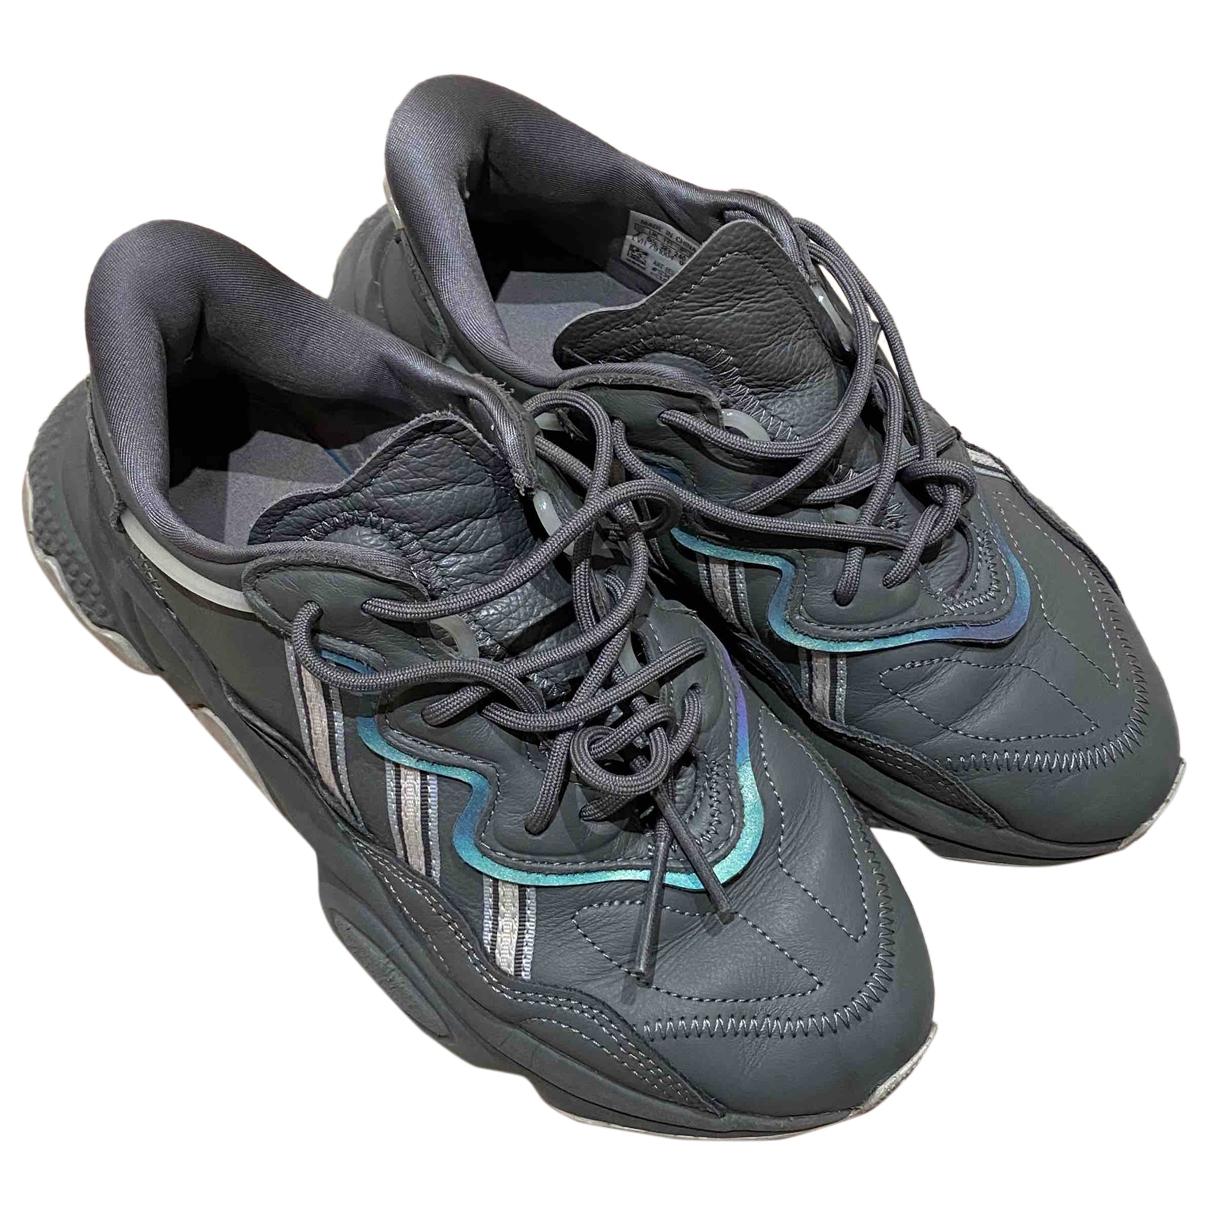 Adidas Ozweego Grey Leather Trainers for Women 5.5 UK